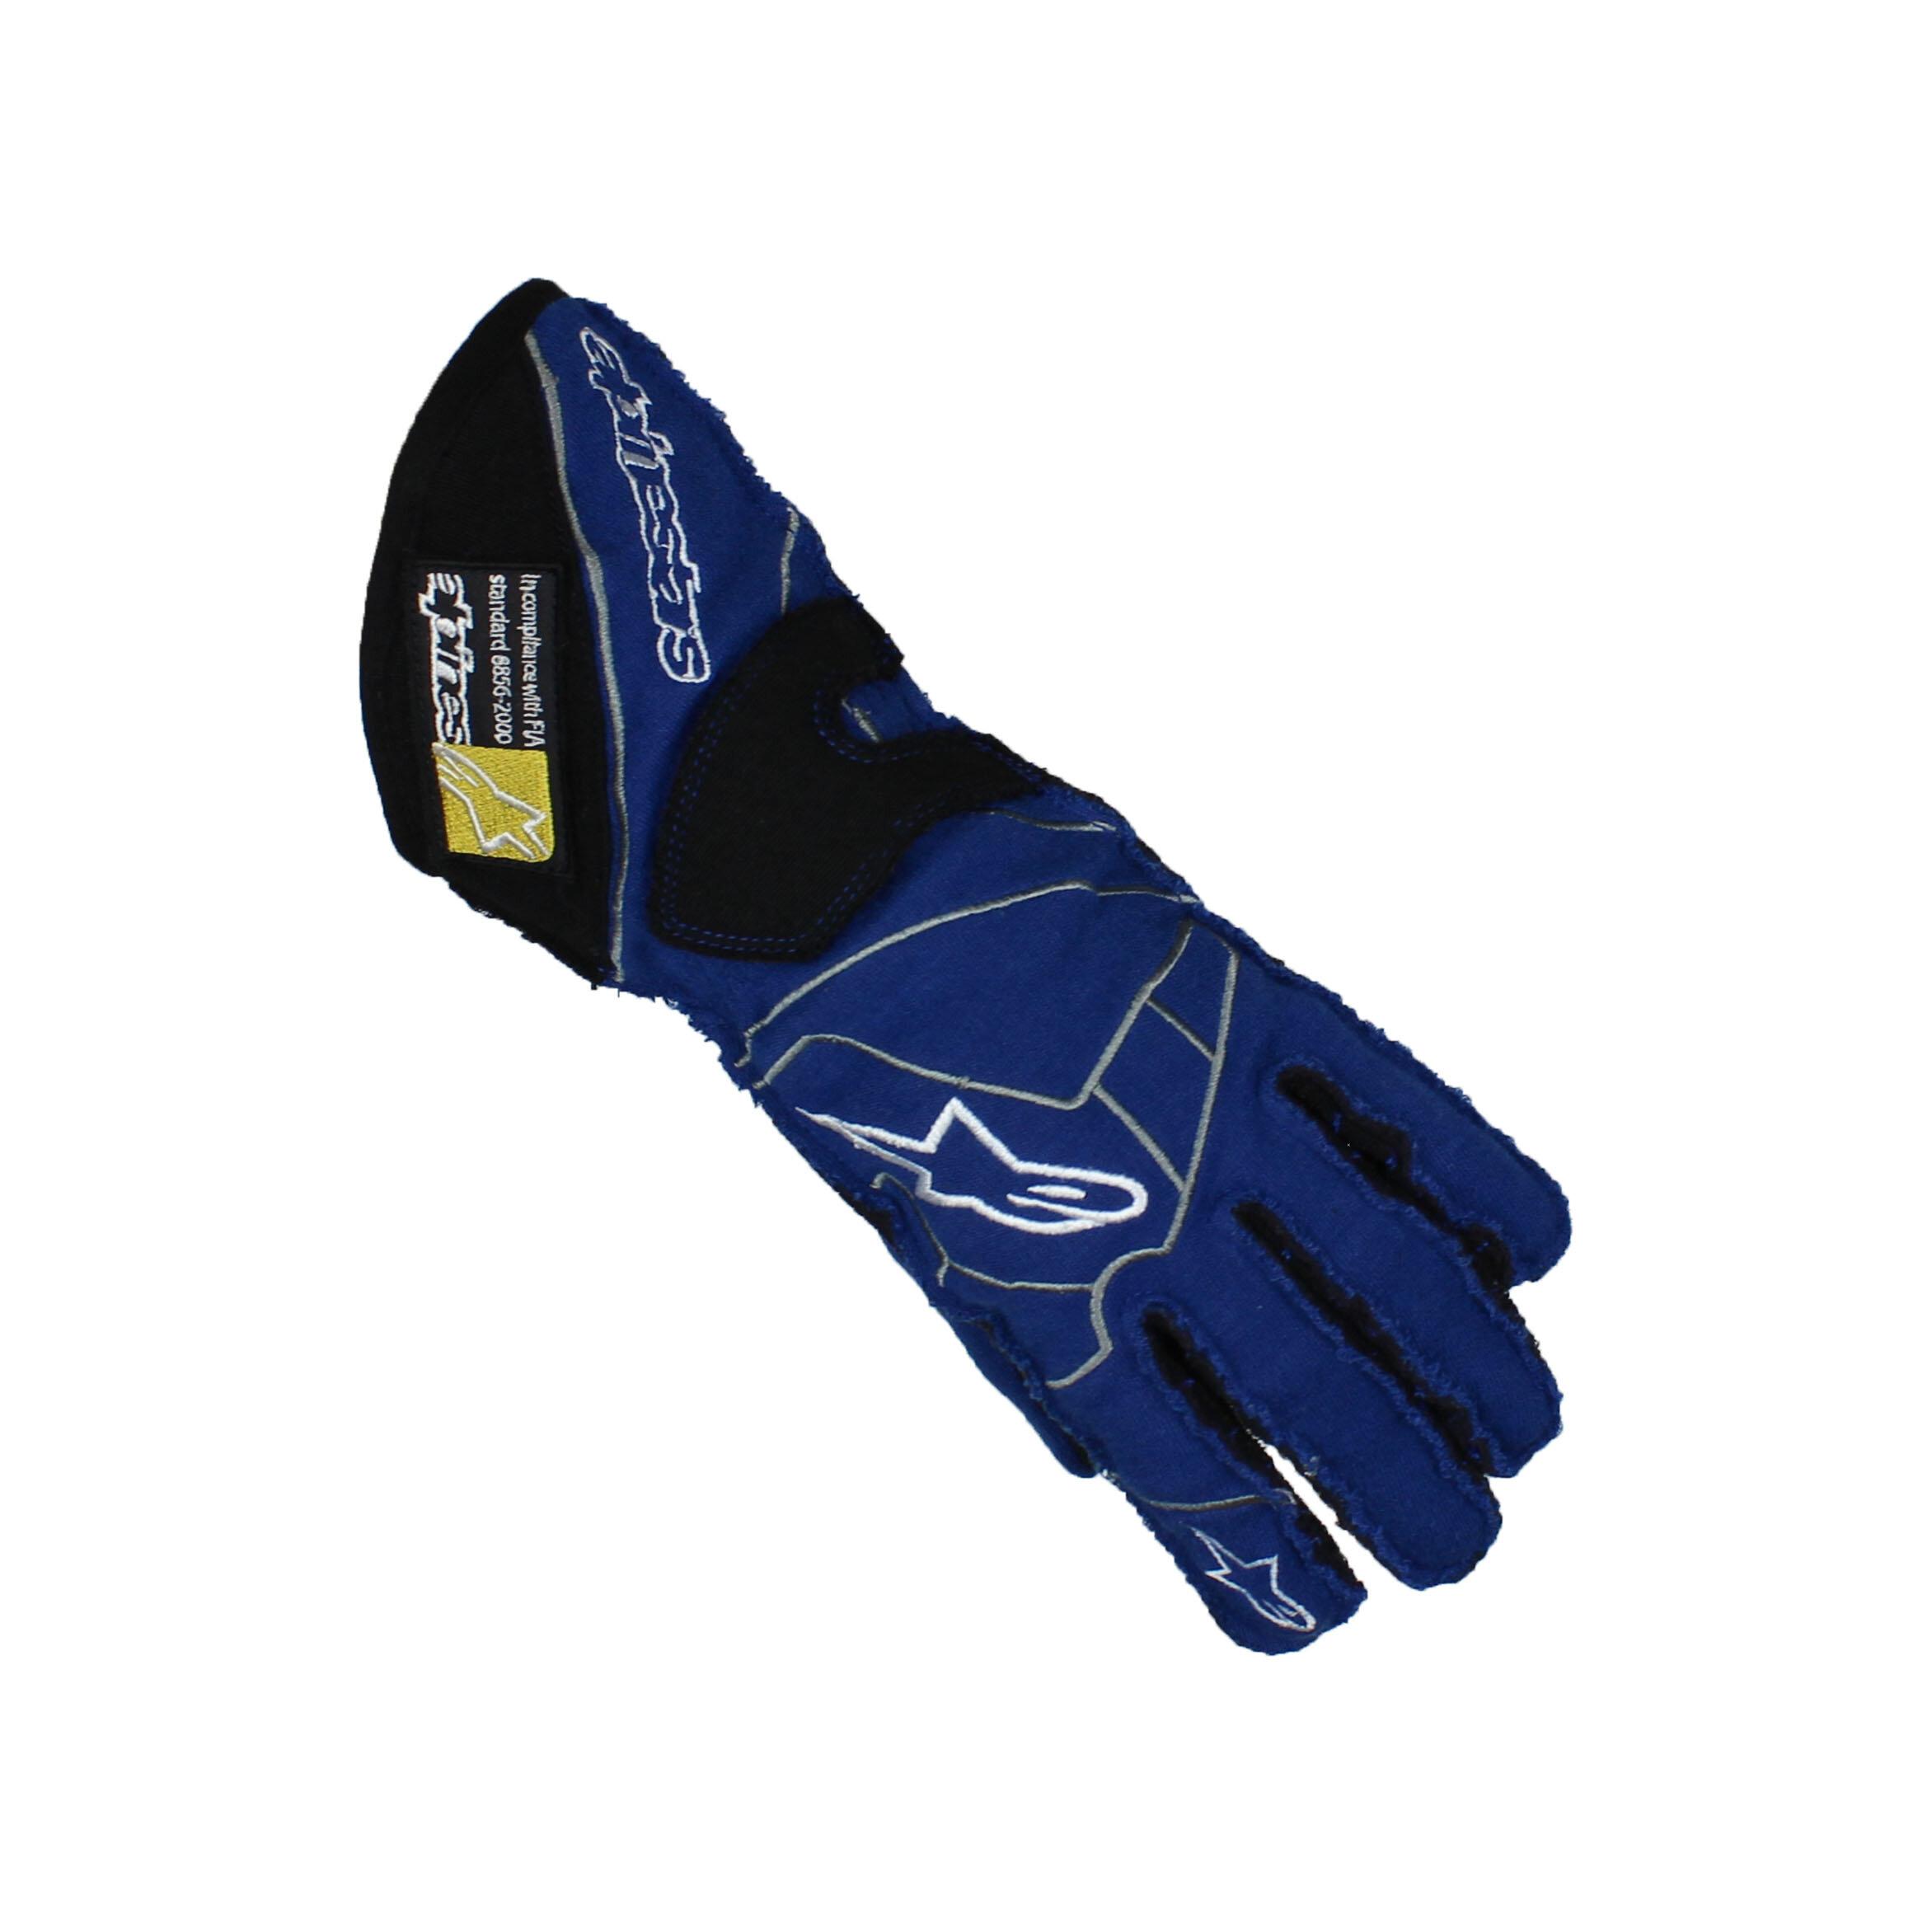 Alpinestars TECH 1-ZX Karting Gloves Blue/Black